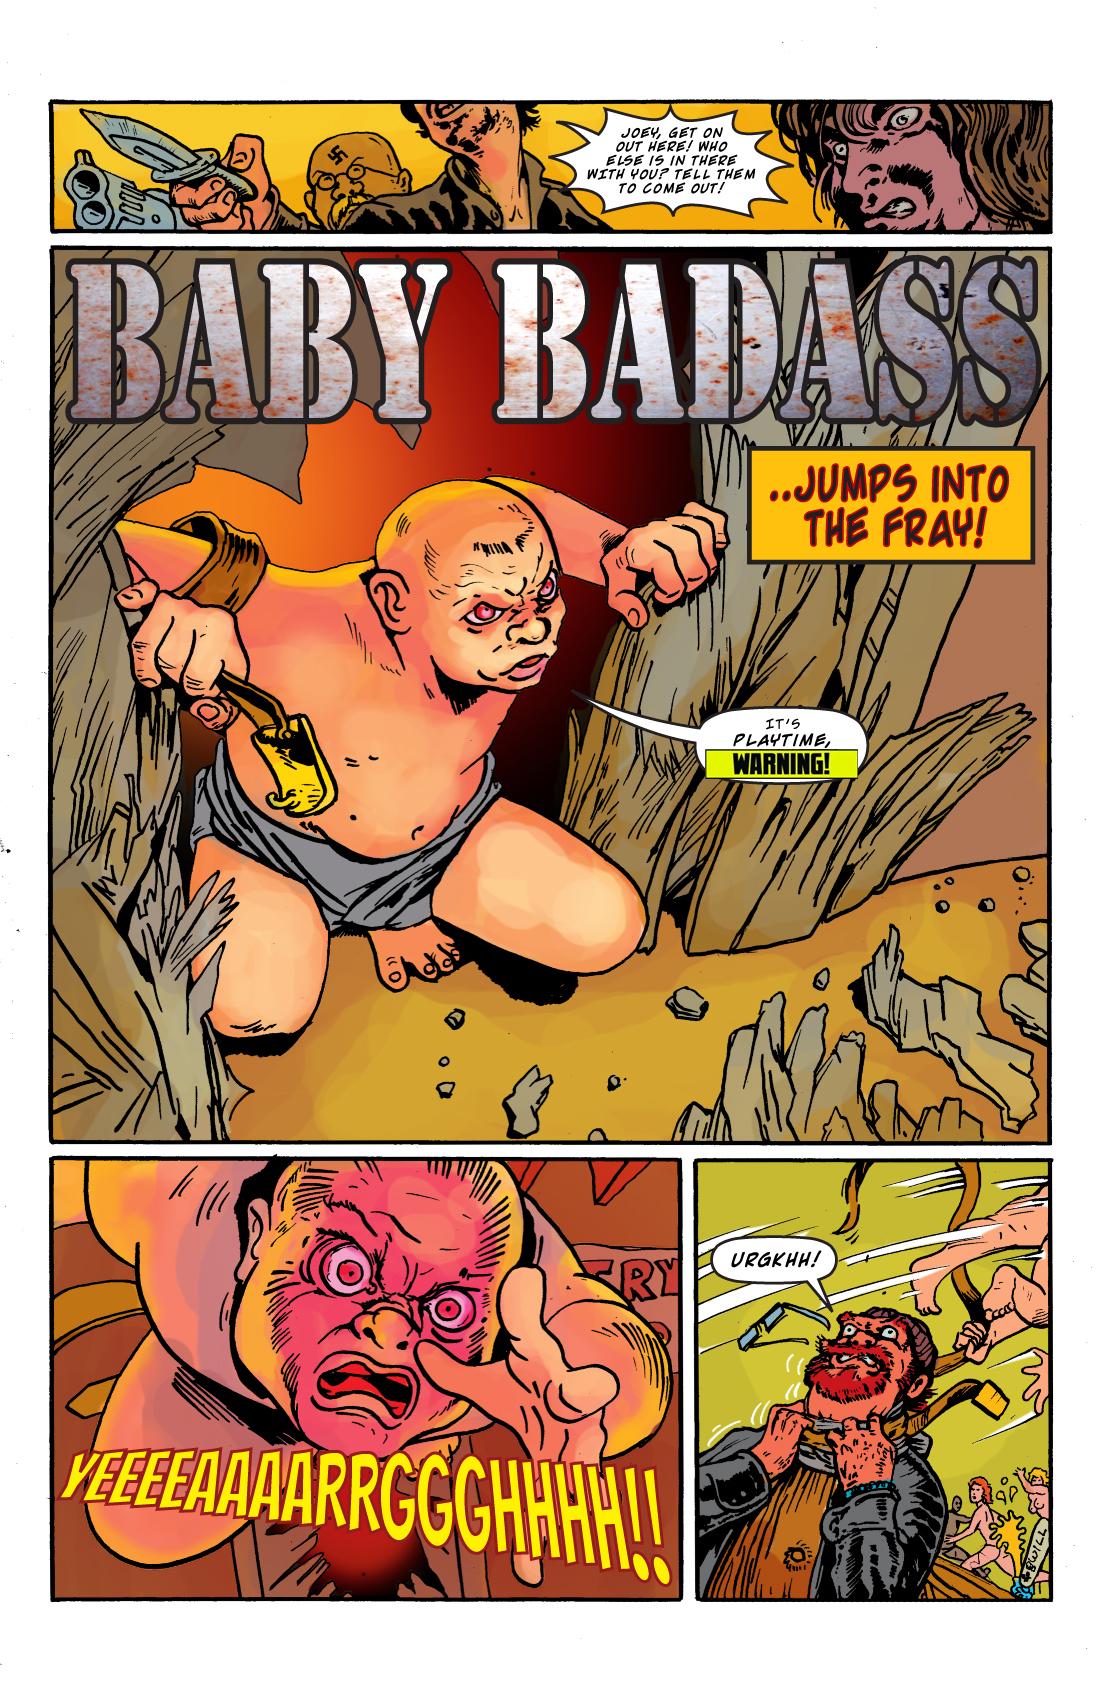 Baby Badass #1 Page 11.jpg